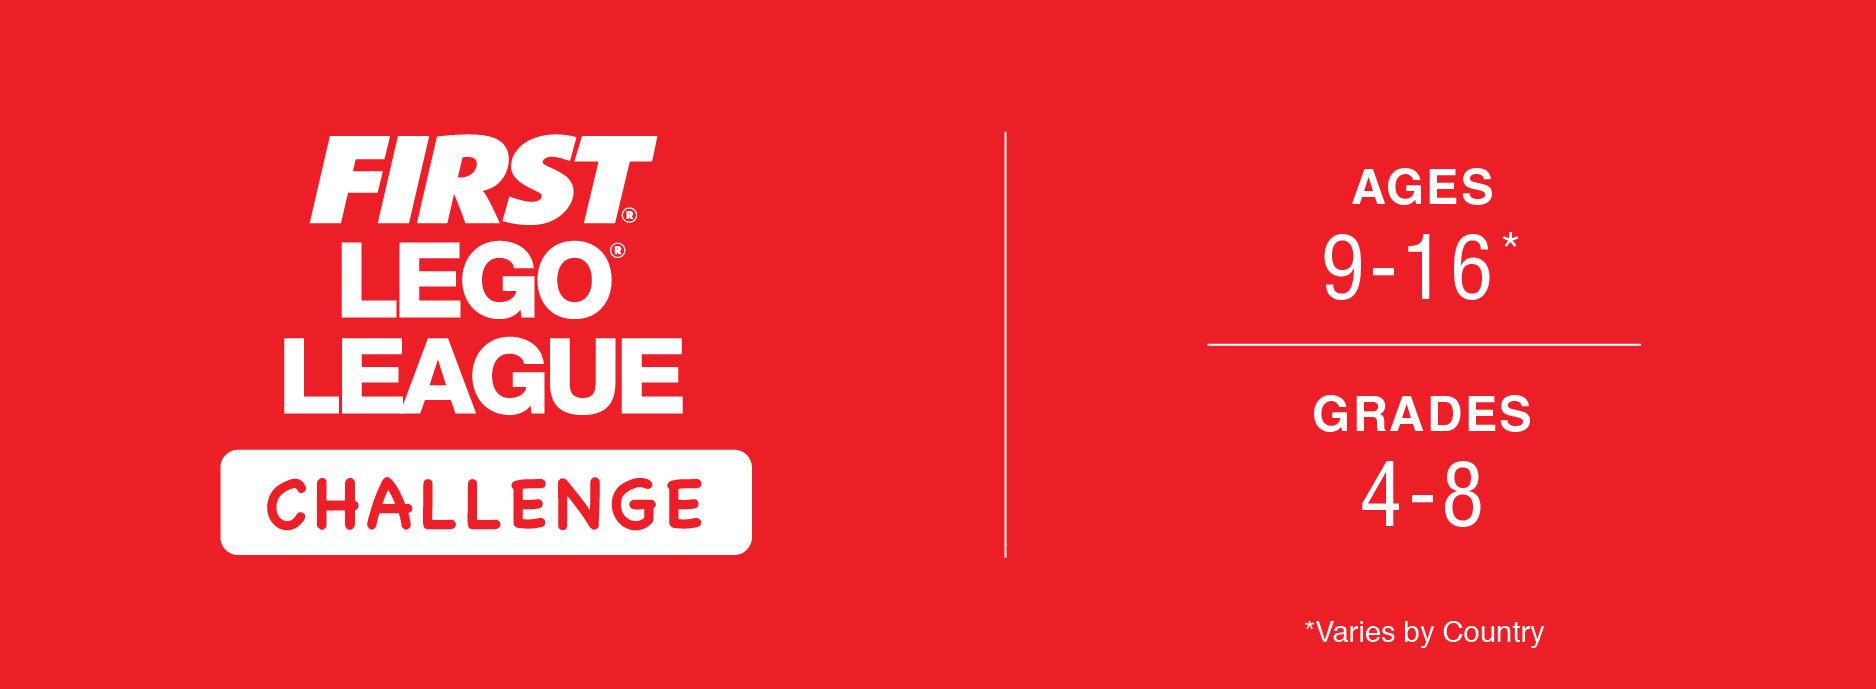 FIRST LEGO League Challenge Logo